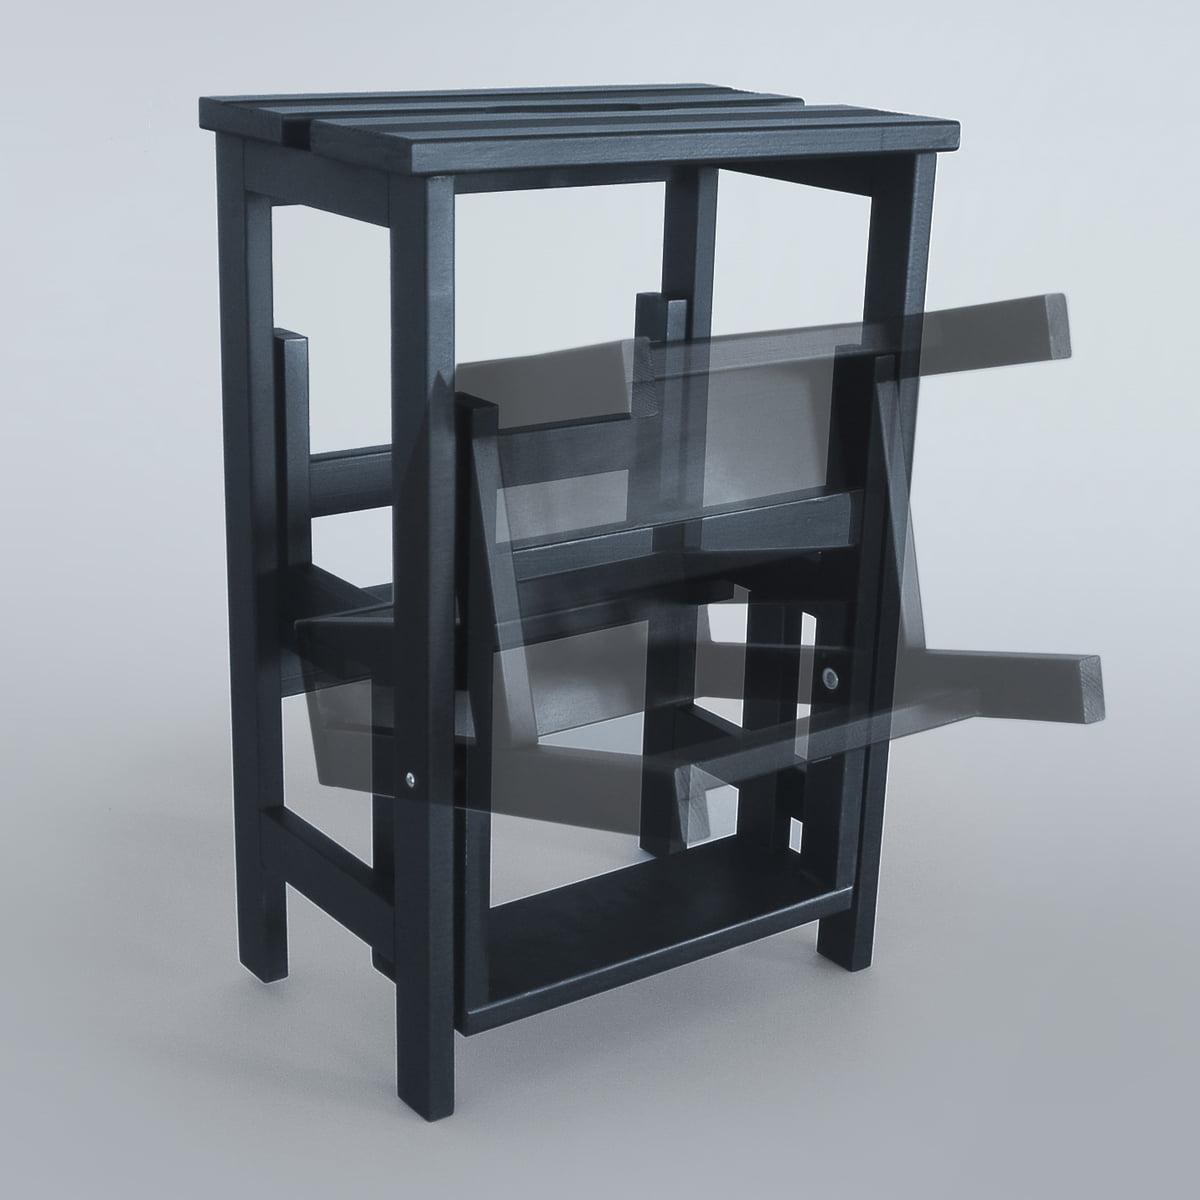 step stool by radius design connox shop. Black Bedroom Furniture Sets. Home Design Ideas